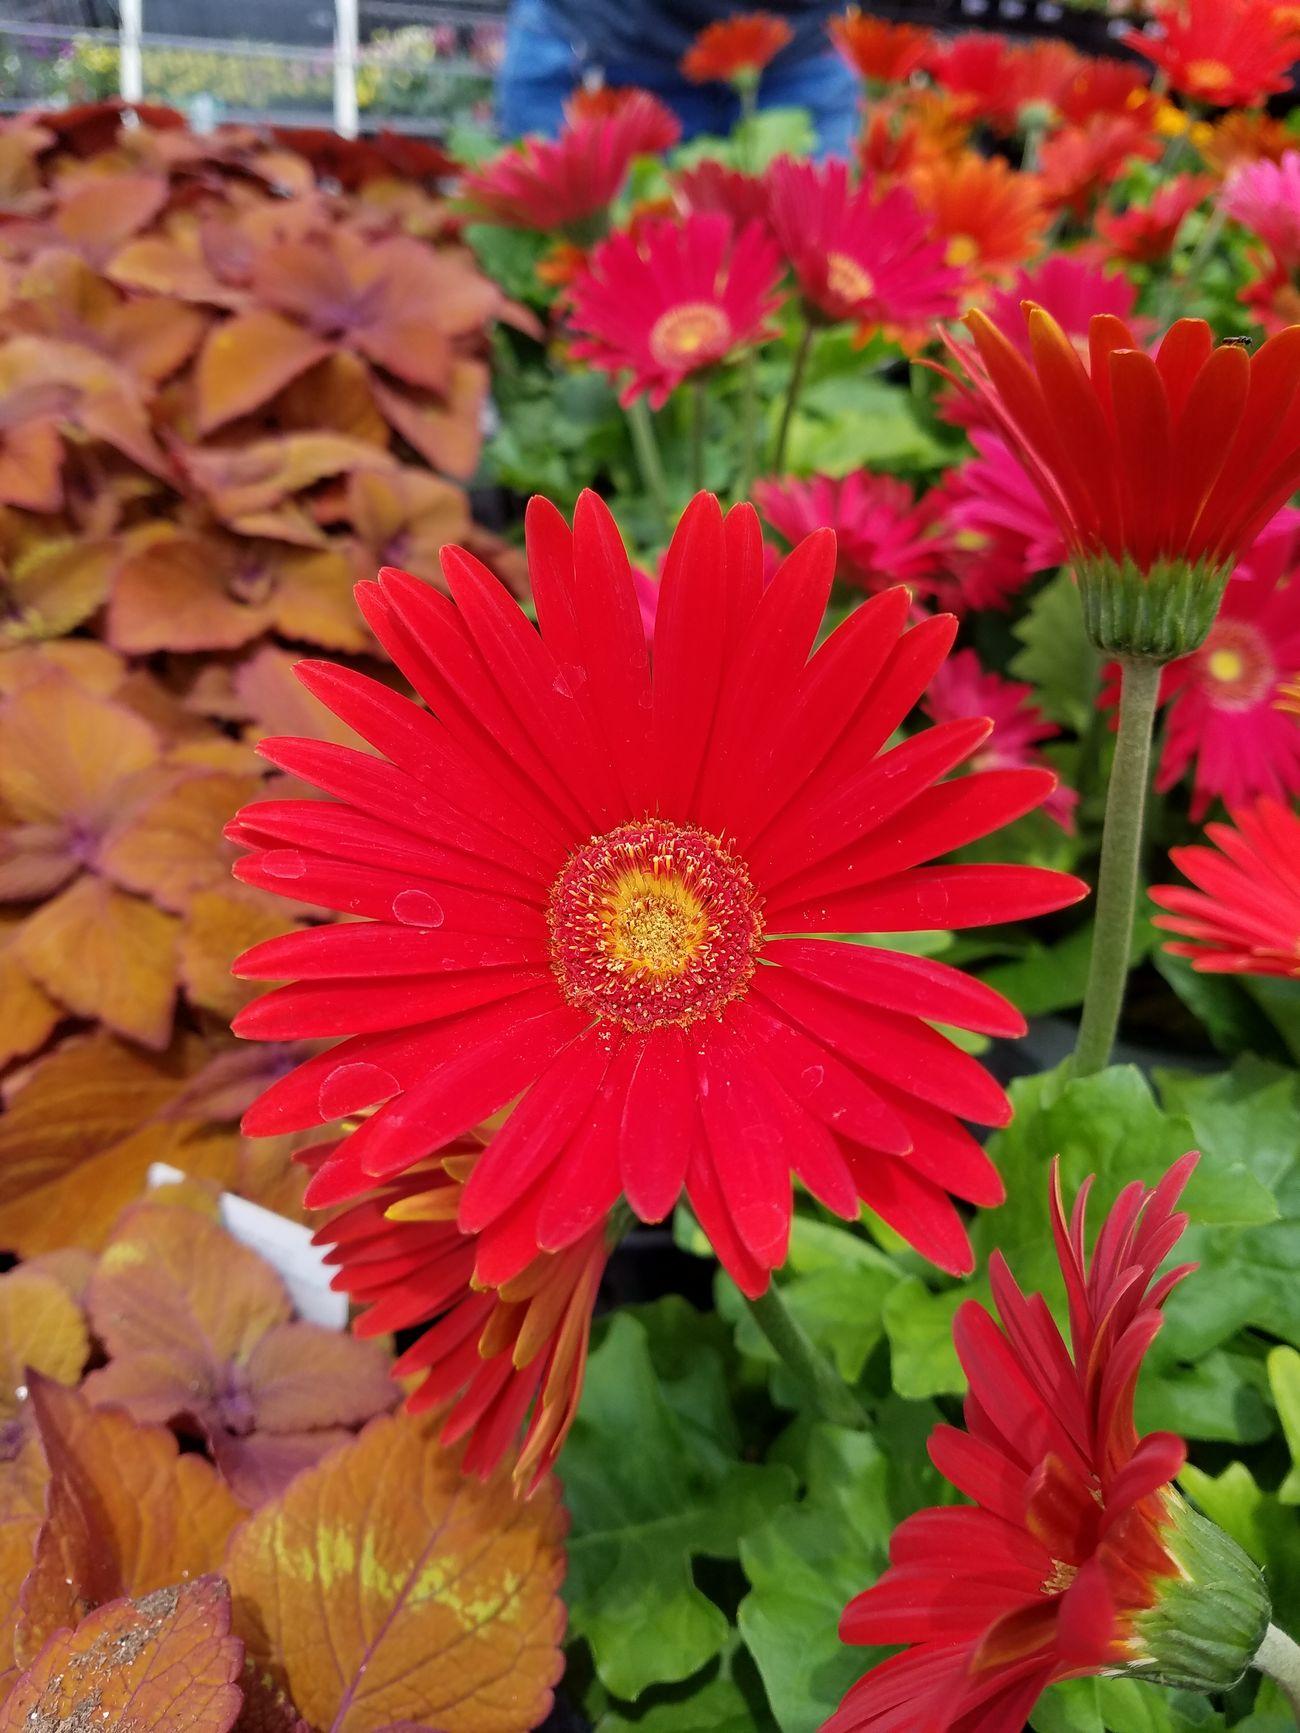 Flamboyant Garden Nature Ujustgotkaied Flowers Petals Bright Red